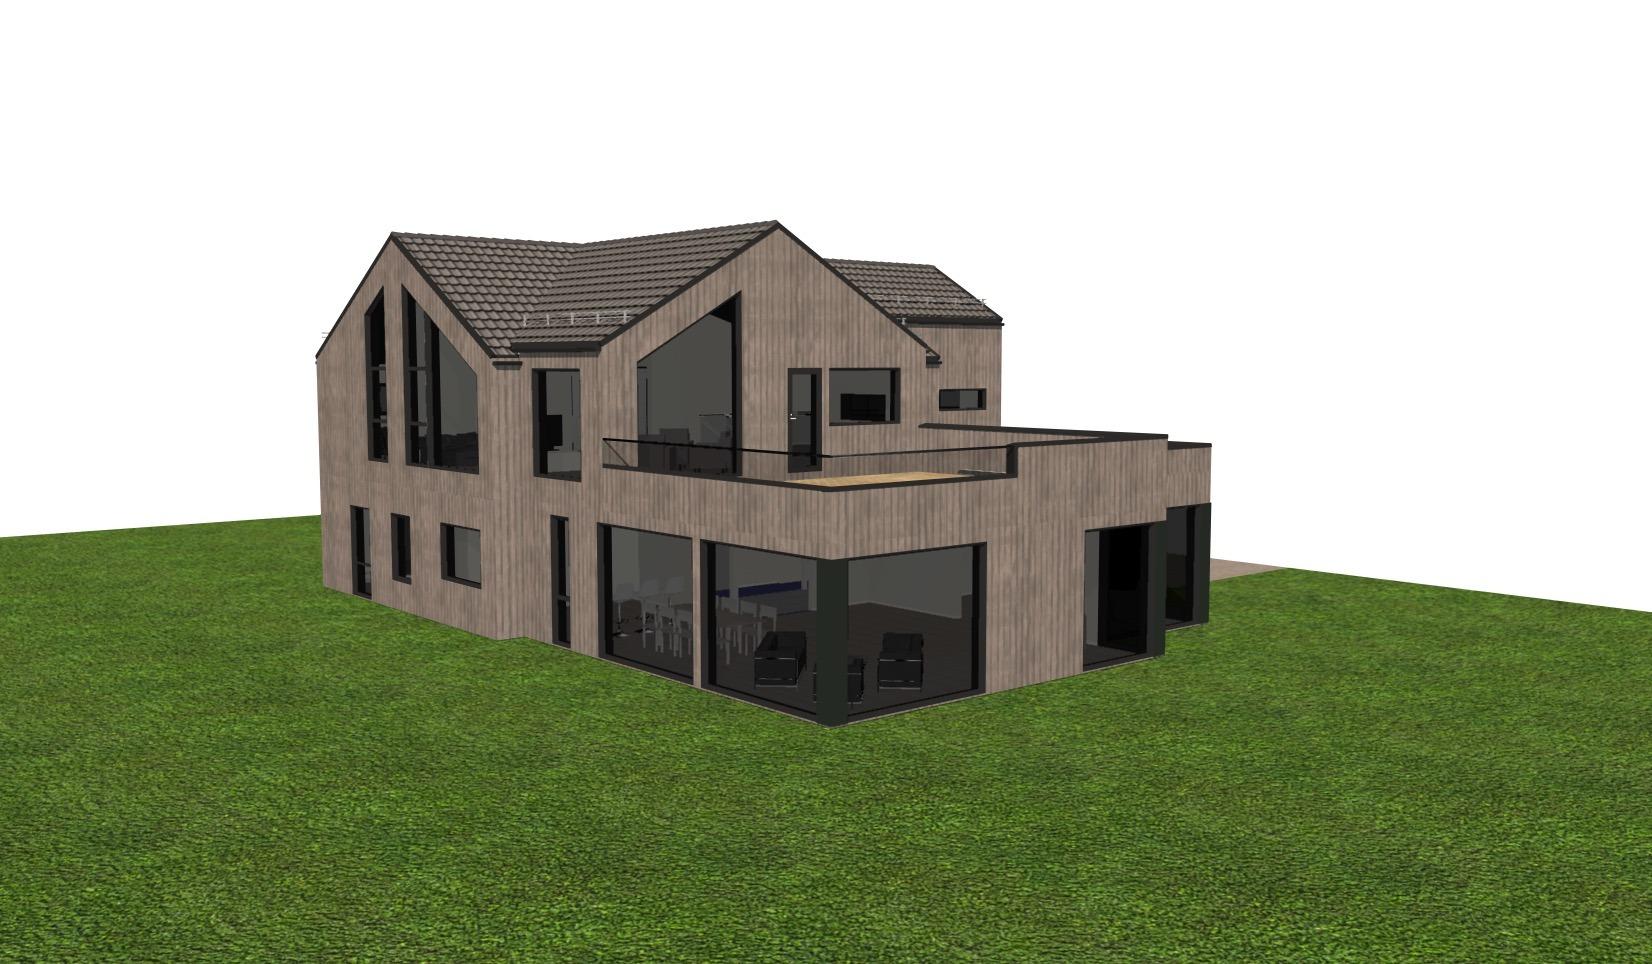 Homrabron fra Rasmussen Bygg - Fasade 1